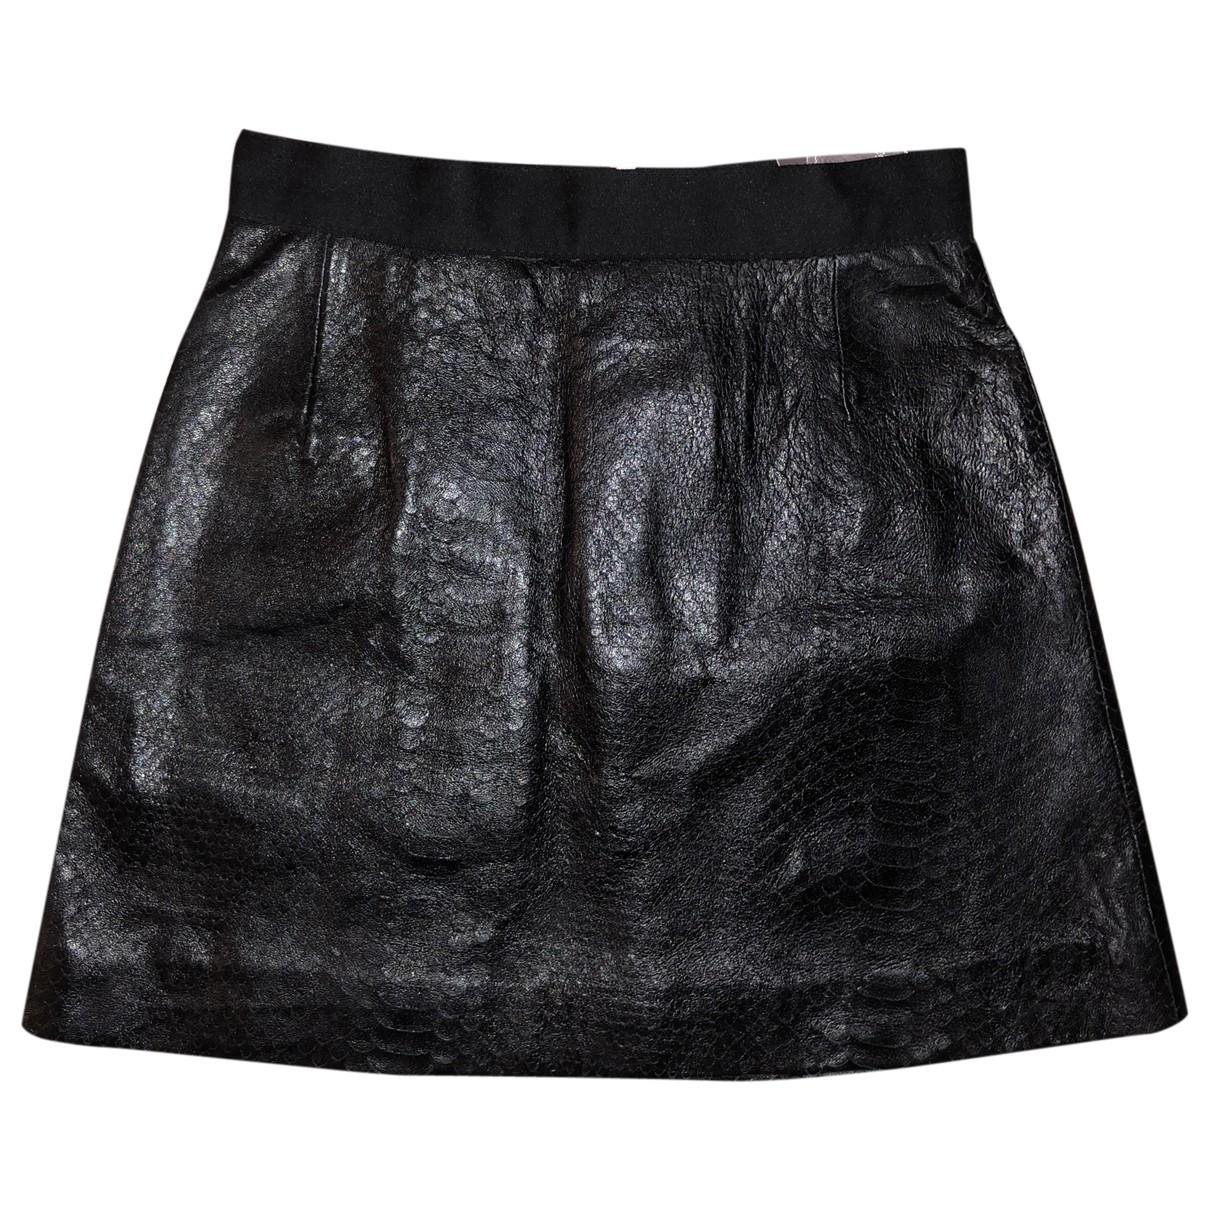 Giambattista Valli X H&m \N Black Leather skirt for Women S International